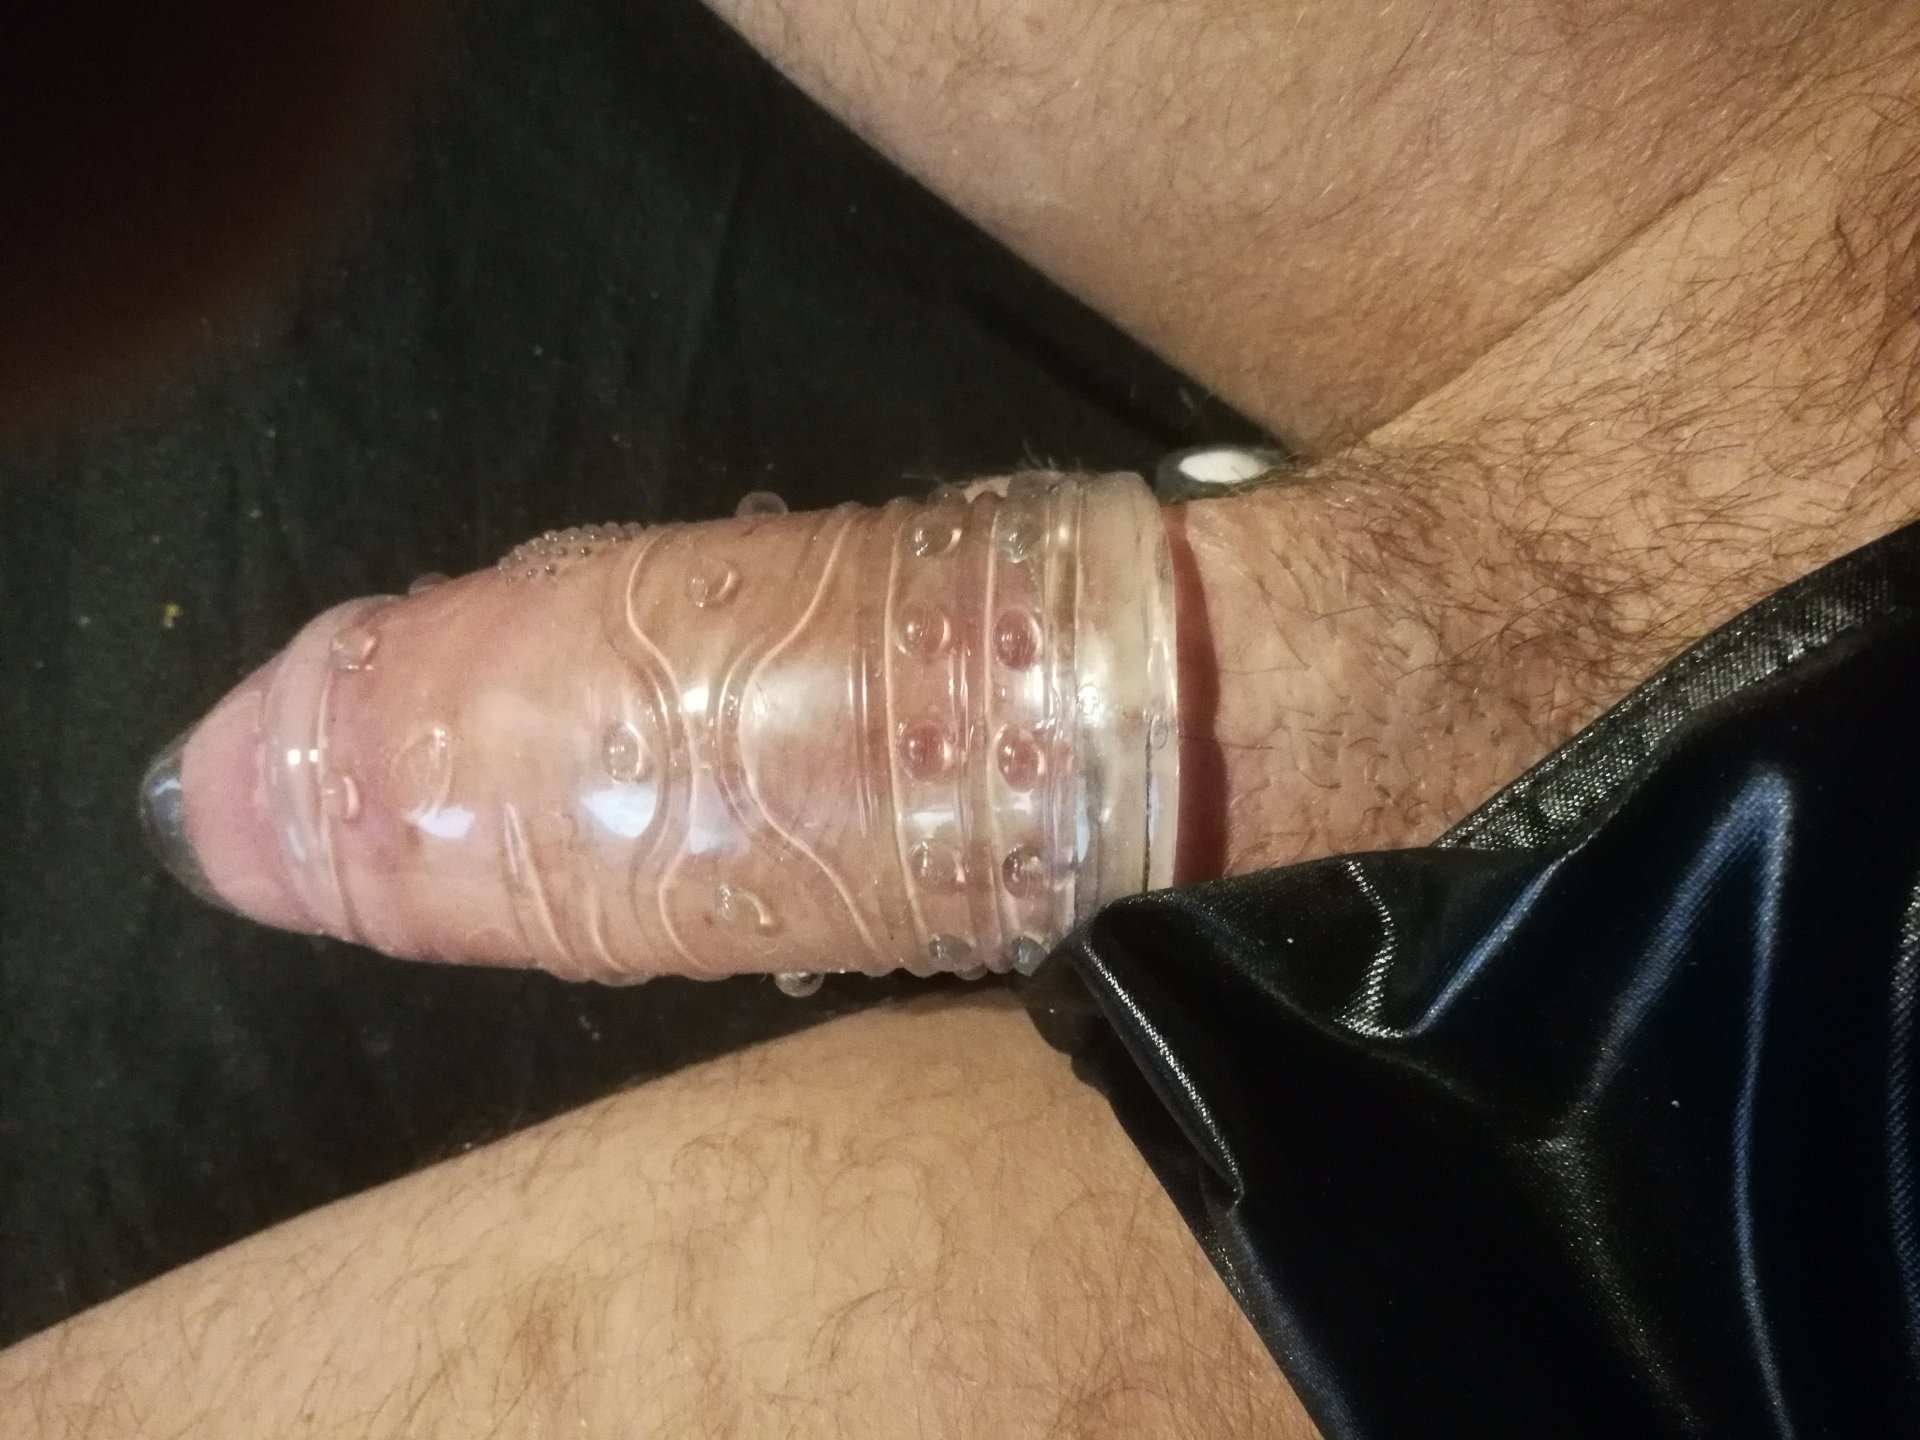 Slaveboy87 uit Oost-Vlaanderen,Belgie